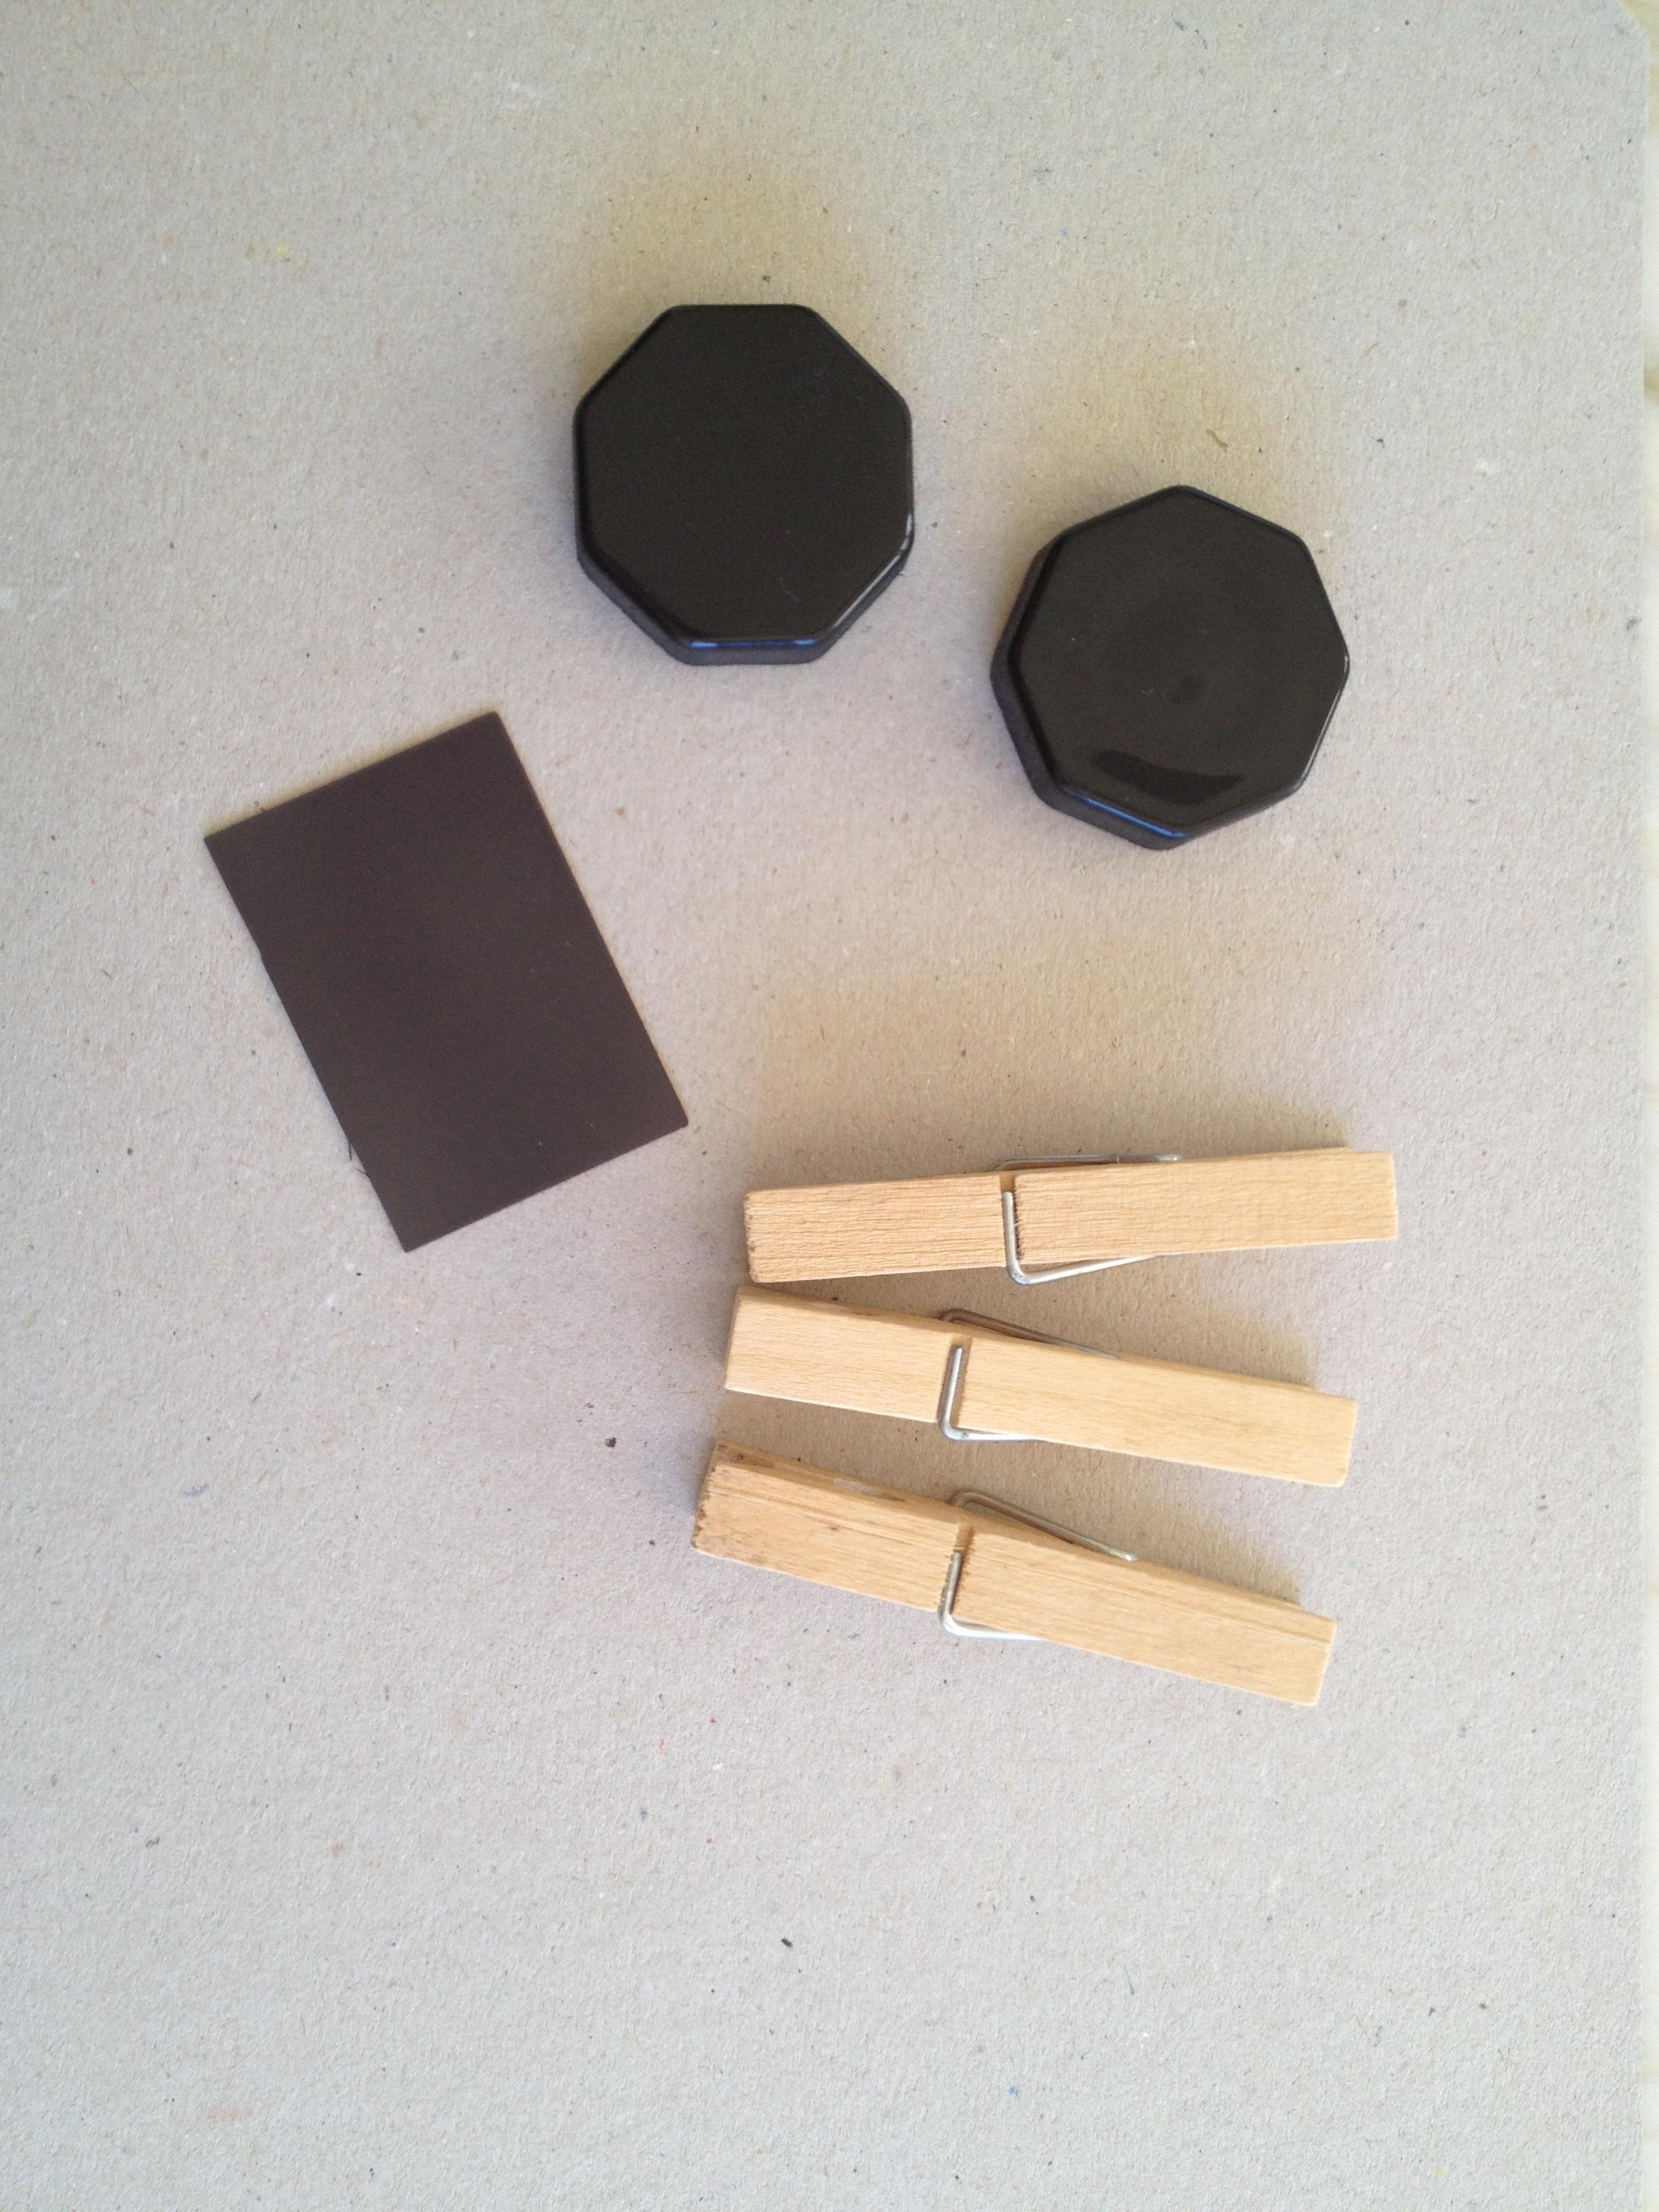 Ganchos de madera para colgar ropa images for Madera para colgar ganchos